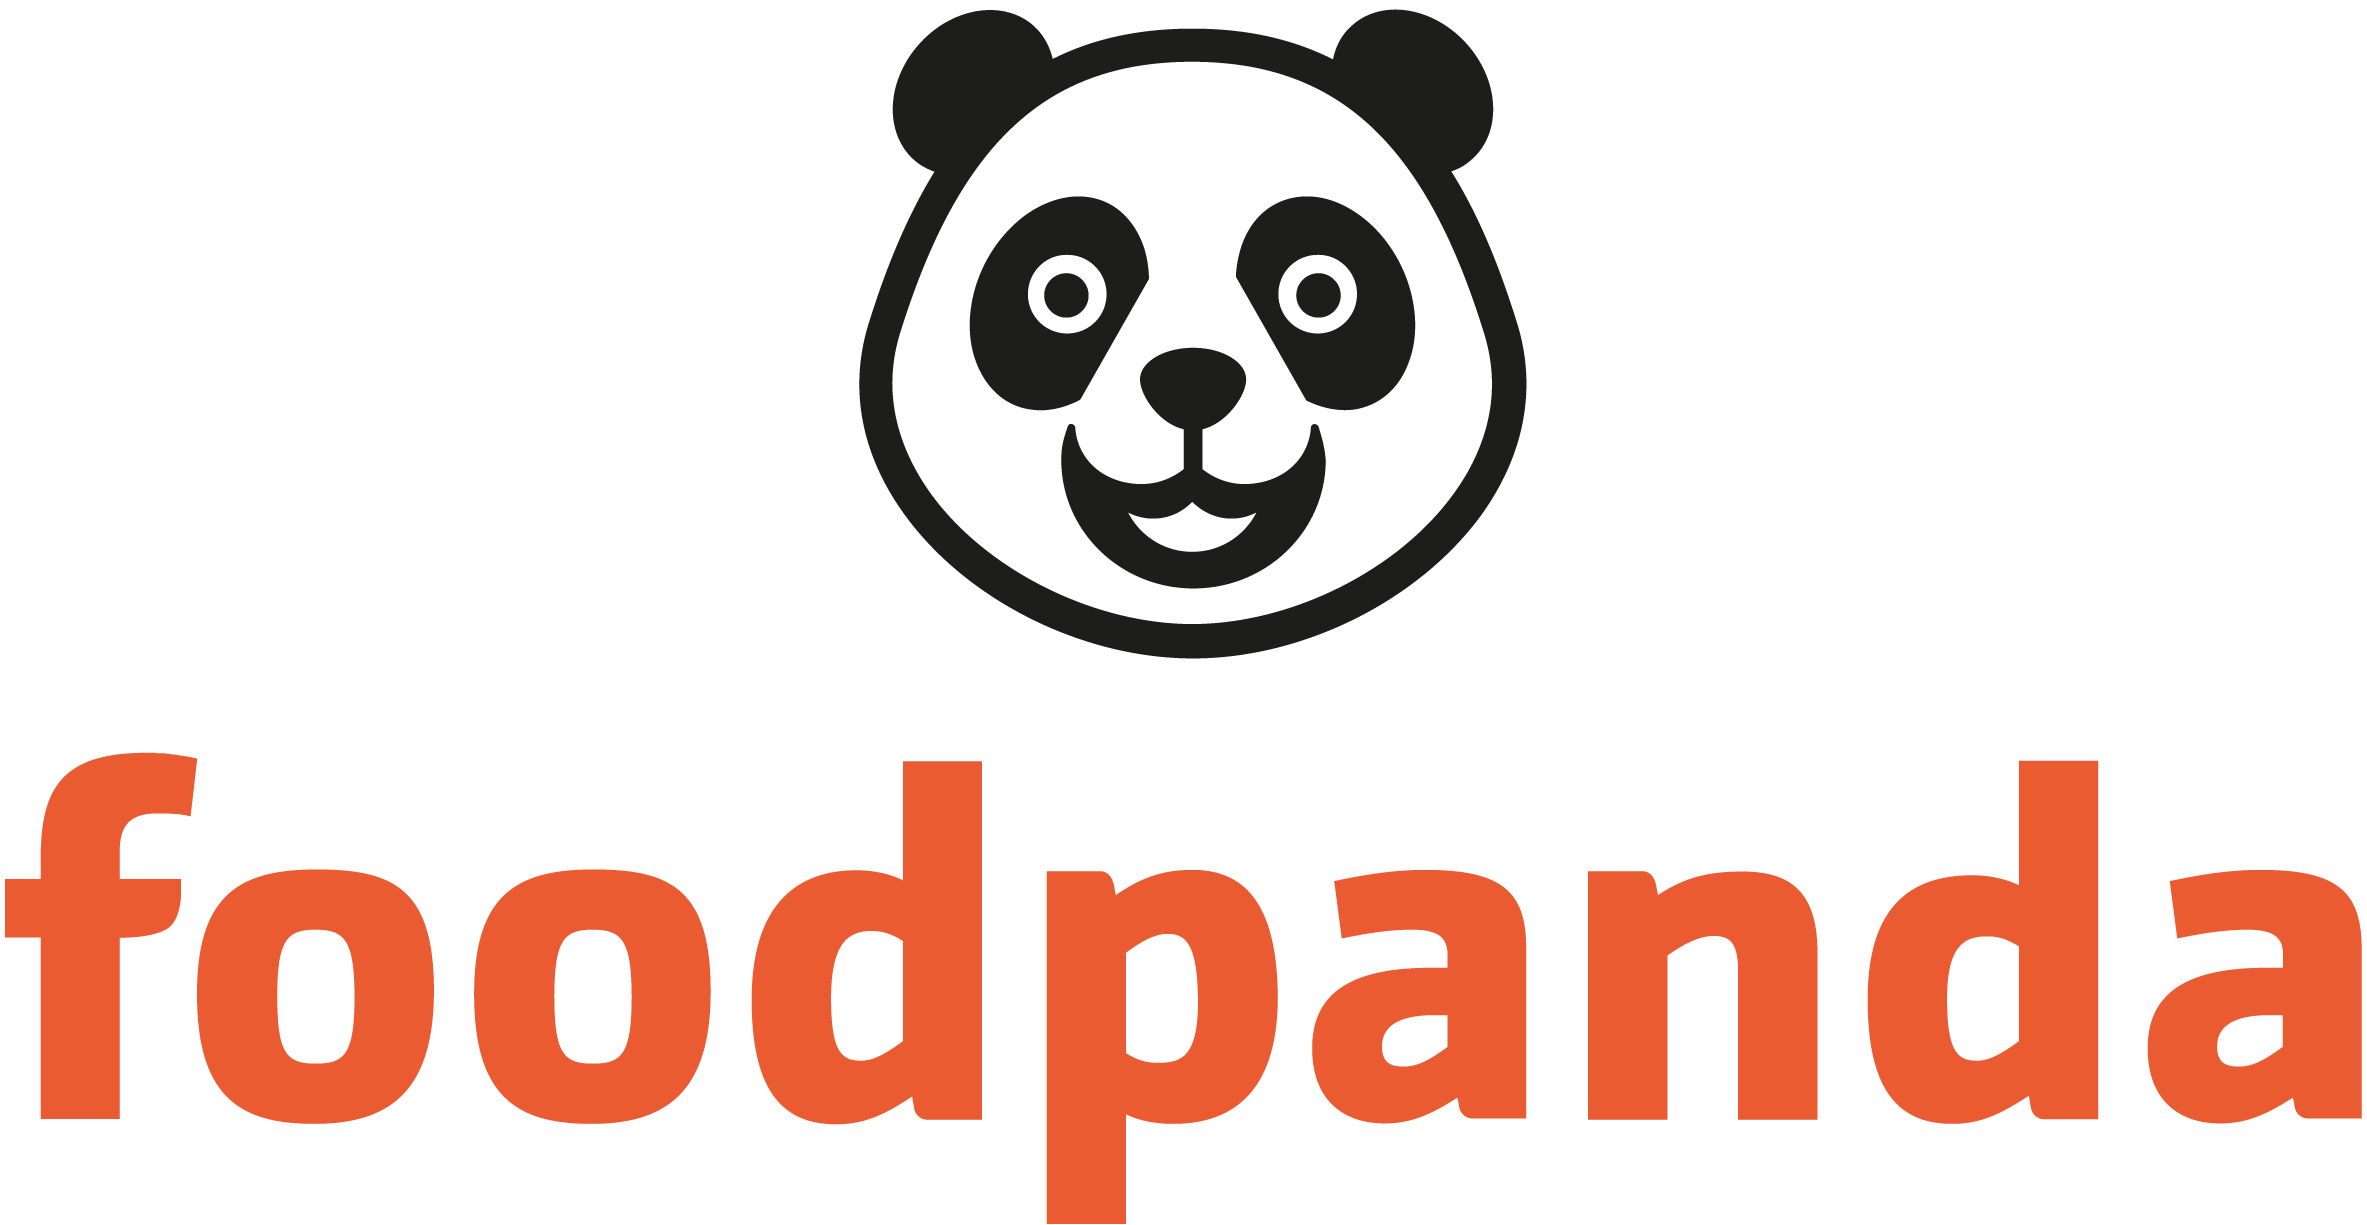 FOOD PANDA LOGO